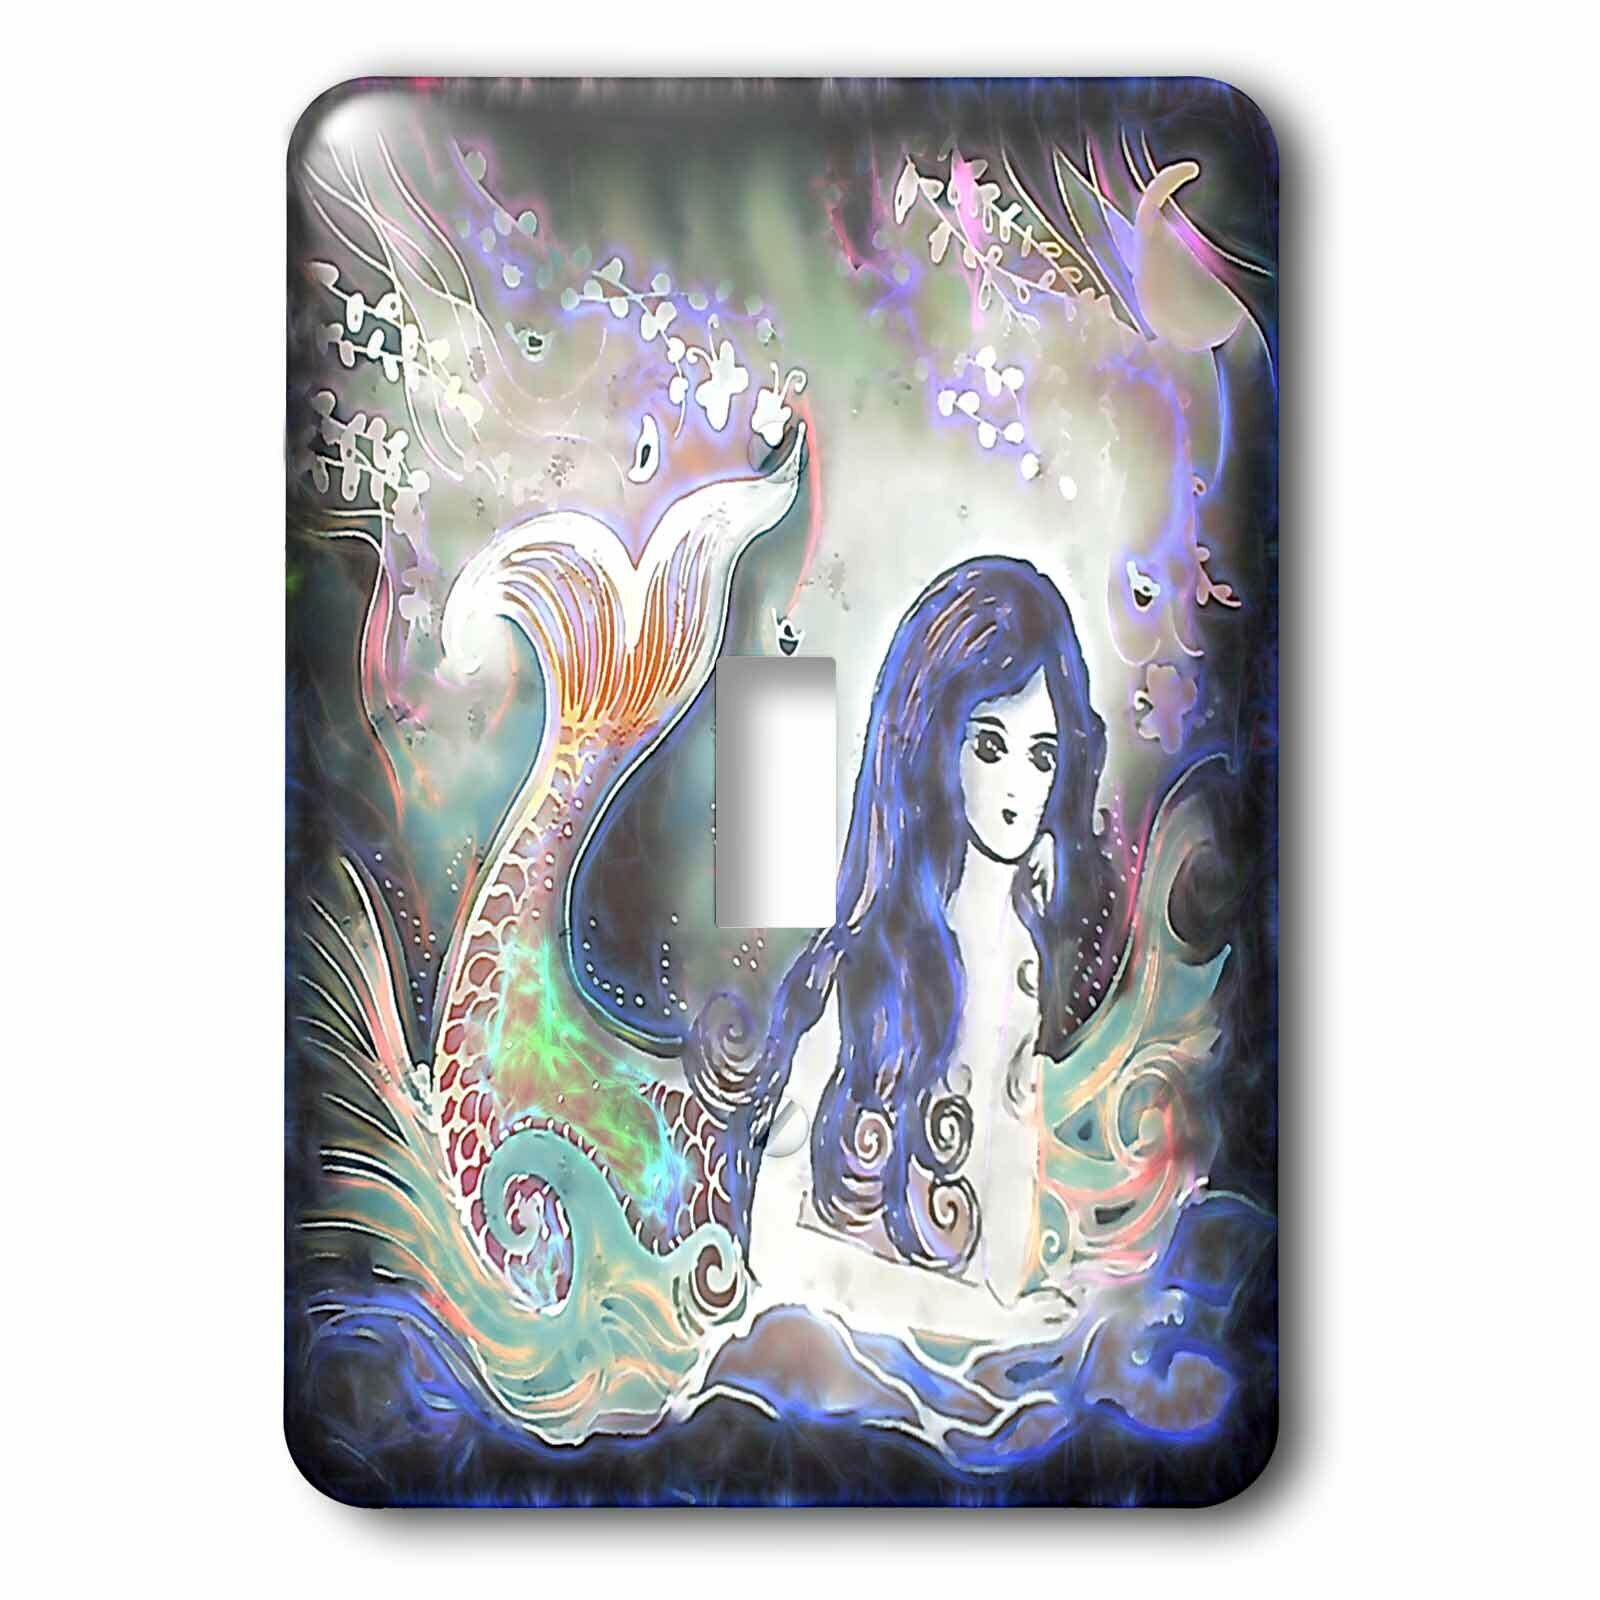 3drose Luminous Beautiful Mermaid In The Water Under The Moon Fantasy Art 1 Gang Toggle Light Switch Wall Plate Wayfair